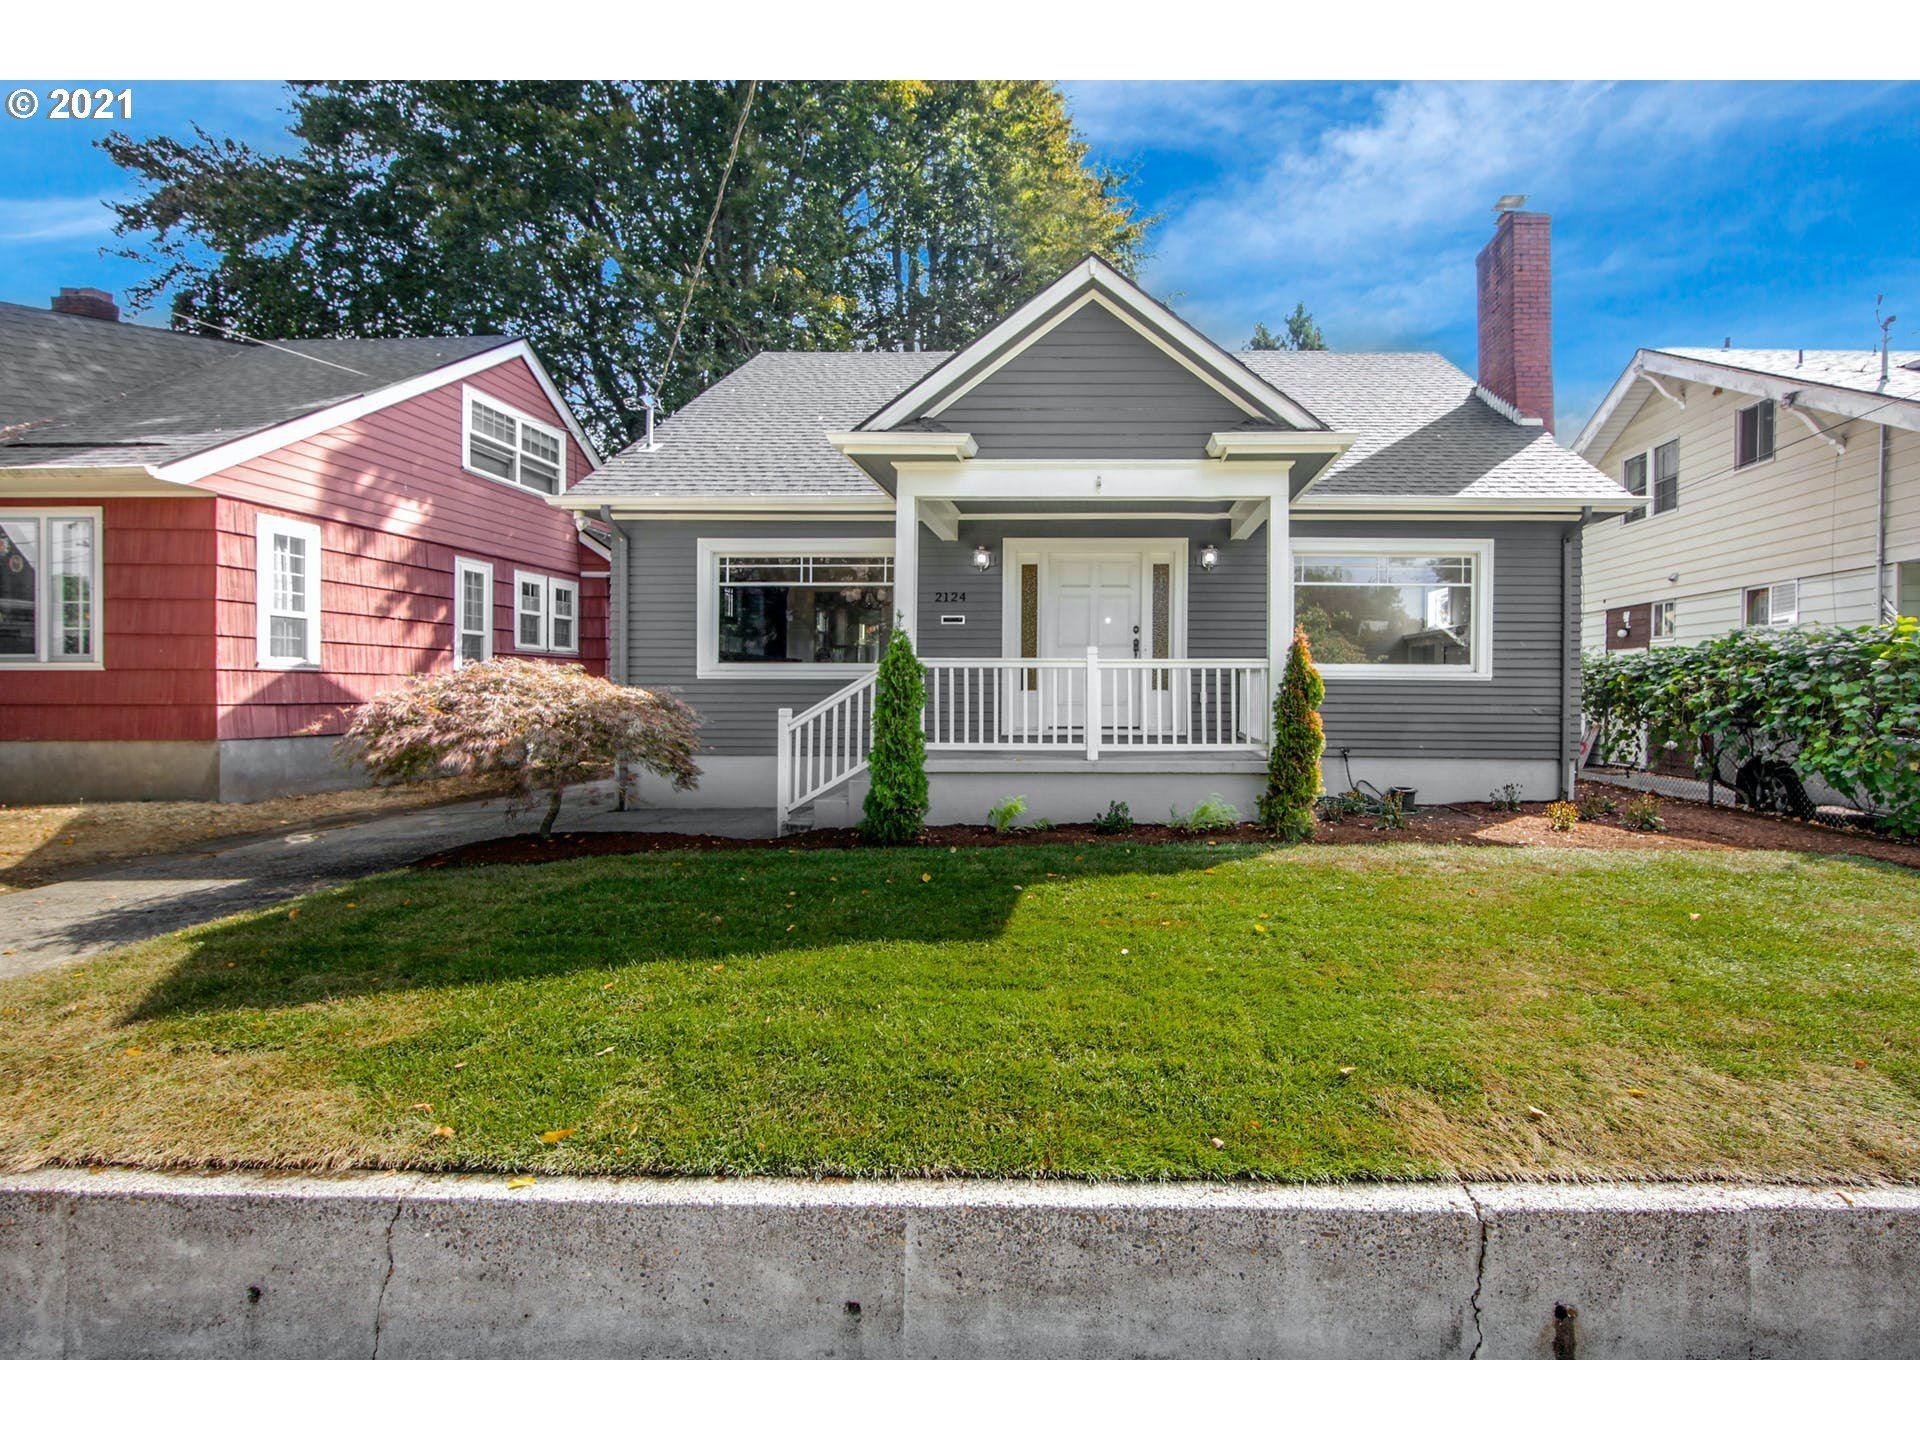 2124 NE 53RD AVE, Portland, OR 97213 - MLS#: 21284574